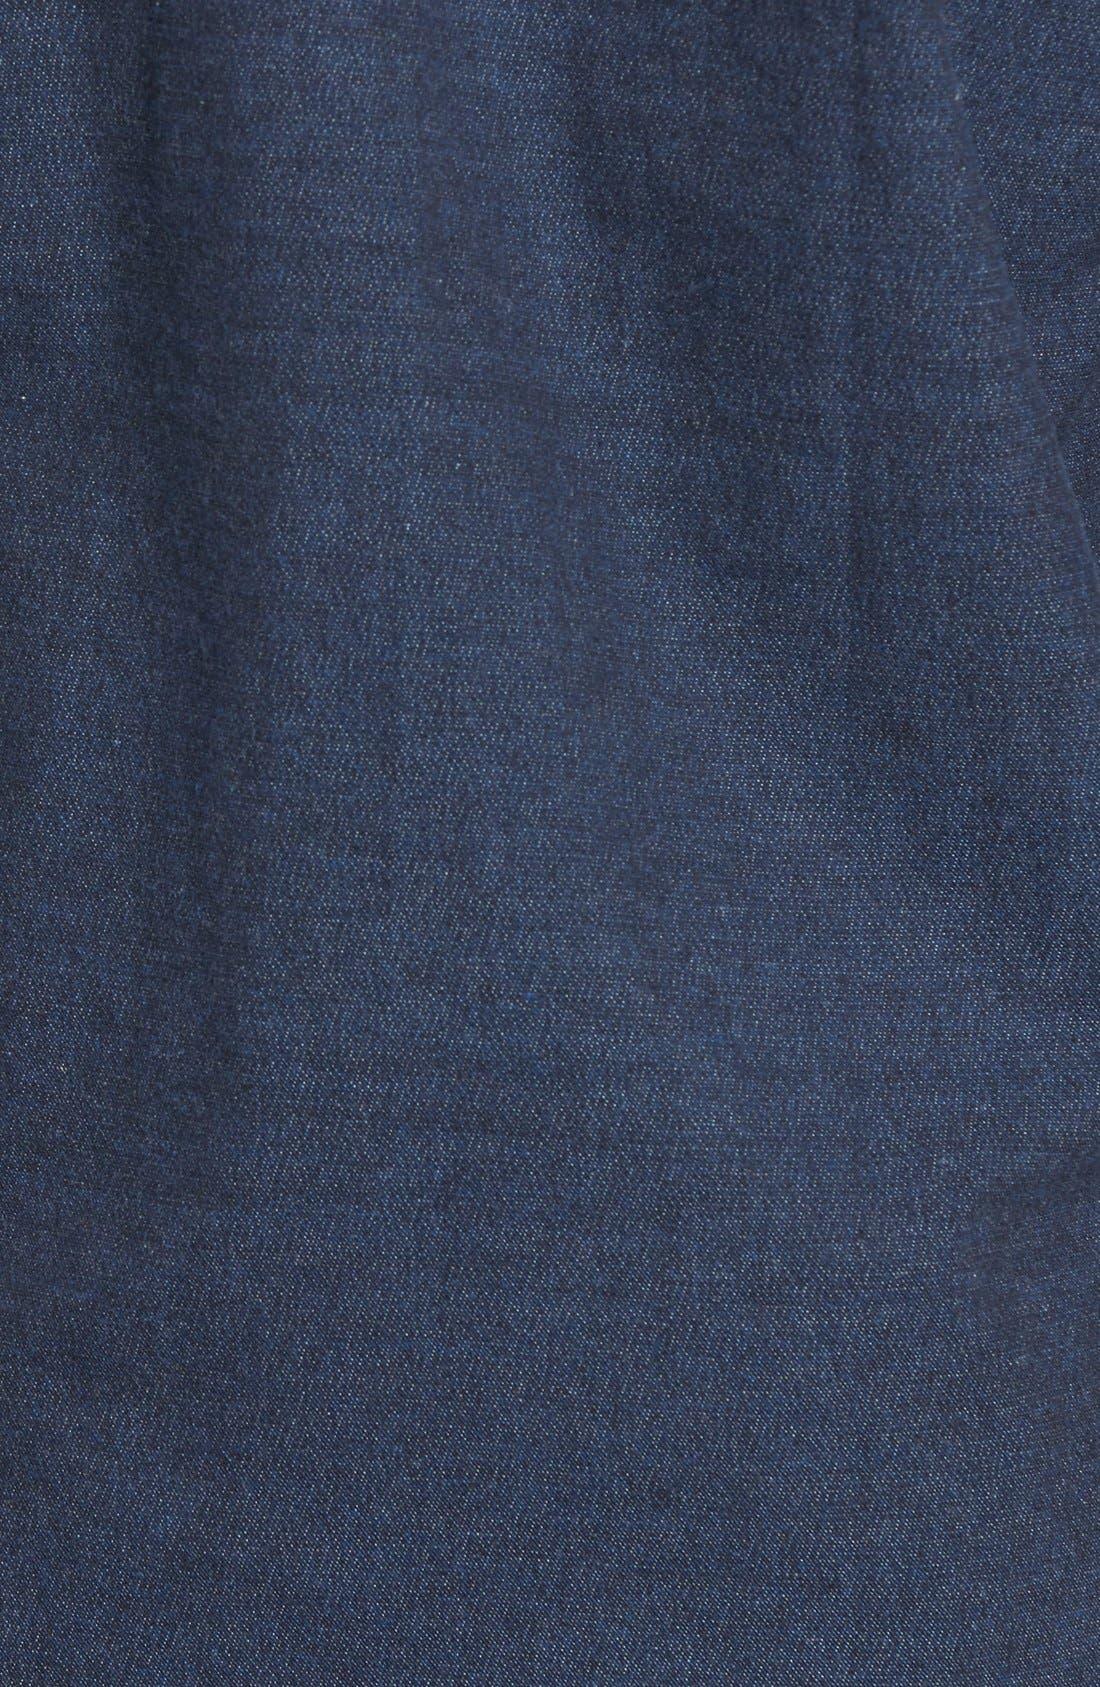 Regular Fit Sport Shirt,                             Alternate thumbnail 3, color,                             400